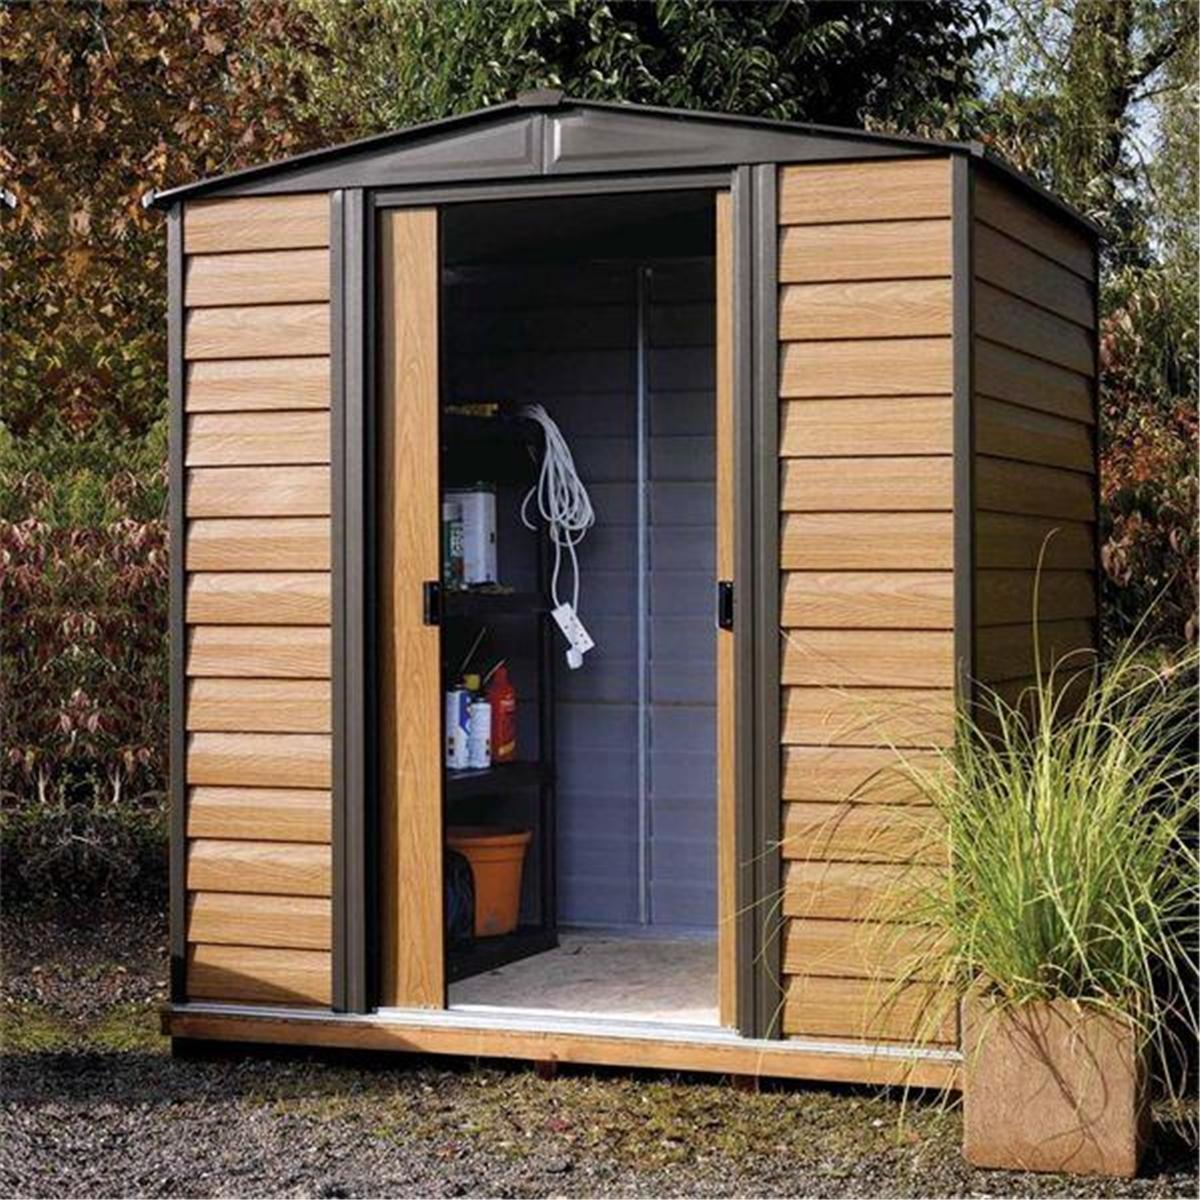 6 x 5 woodvale metal shed 1940mm x 1510mm shedsfirst. Black Bedroom Furniture Sets. Home Design Ideas